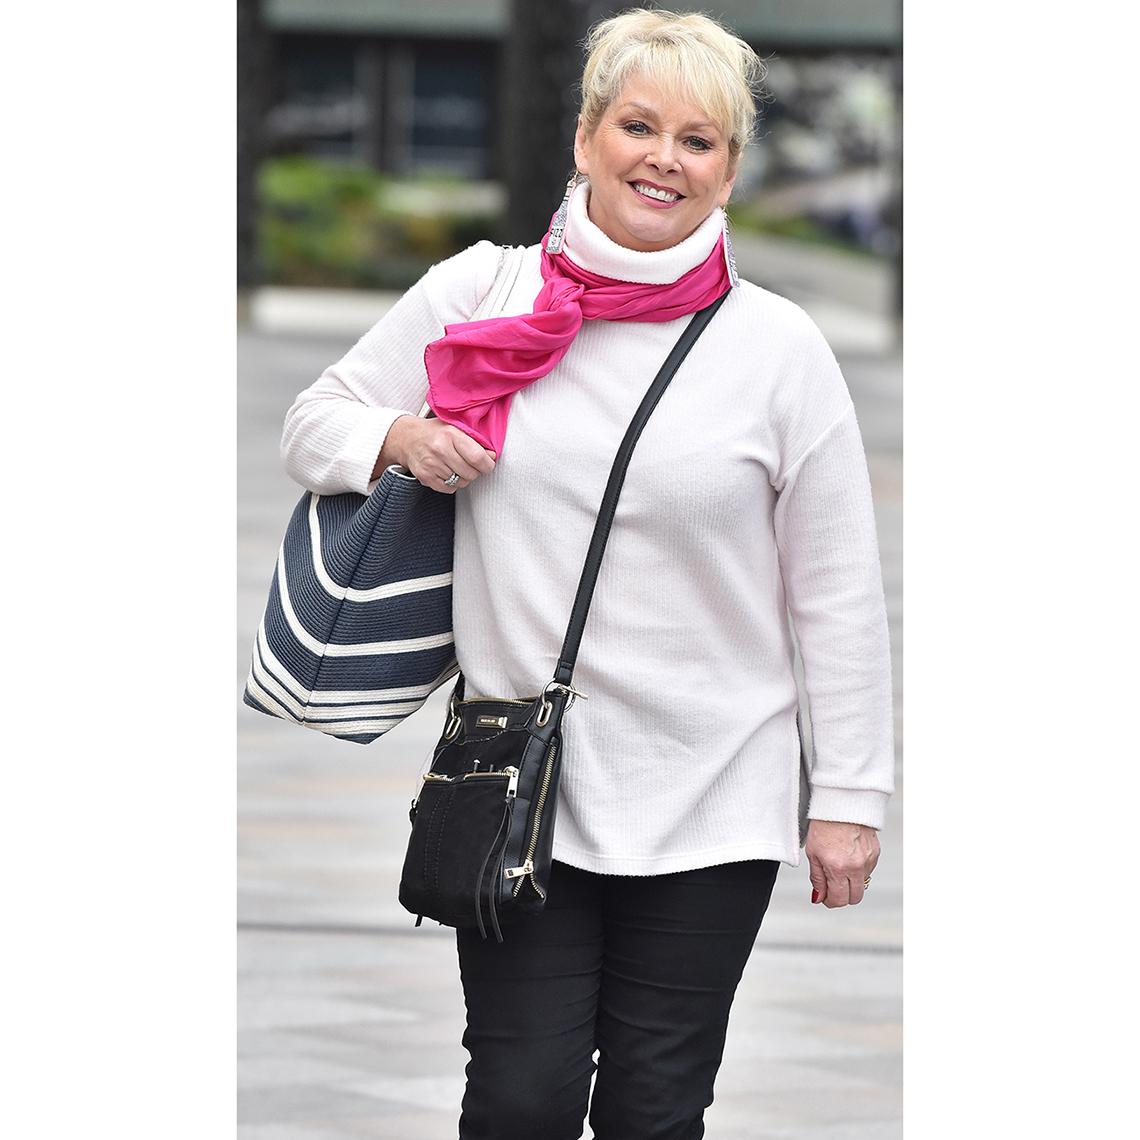 Cheryl Baker with two handbags